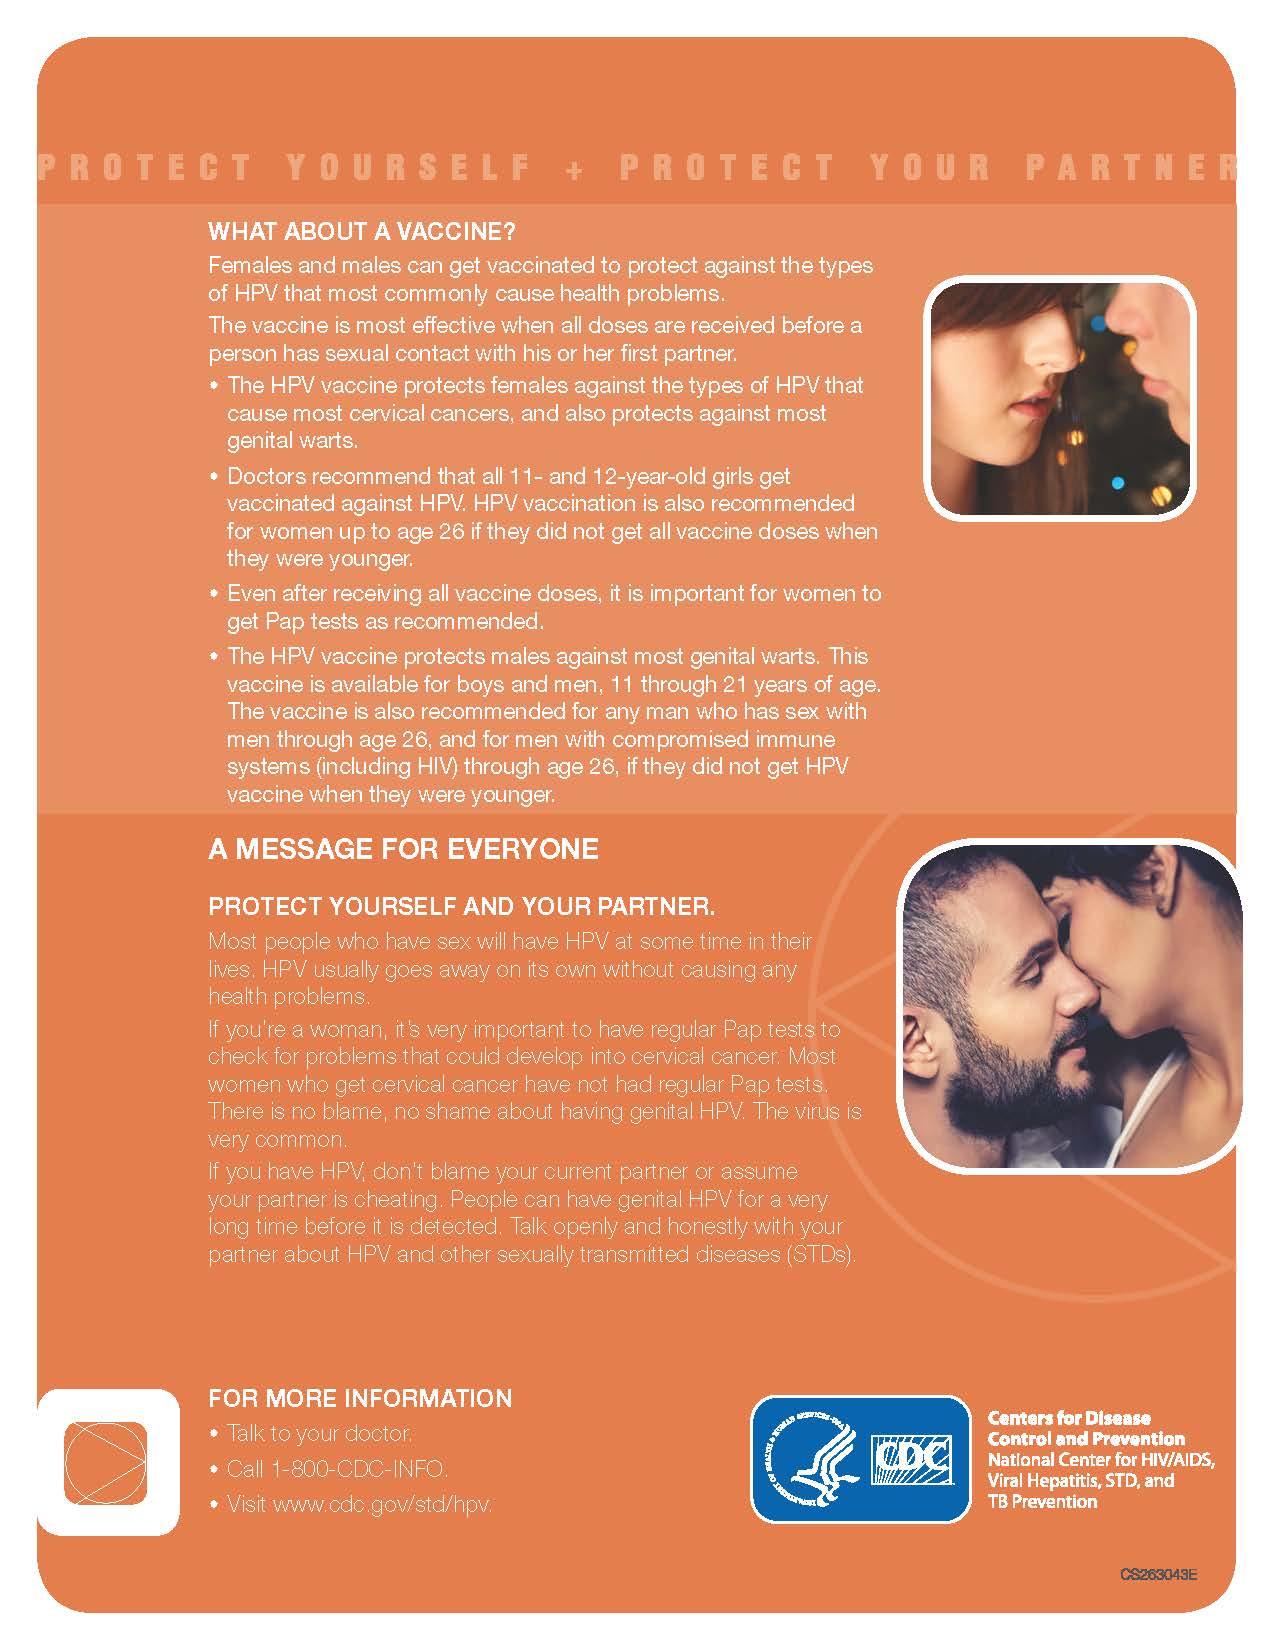 human papillomavirus facts sintomas de papiloma virus en el hombre